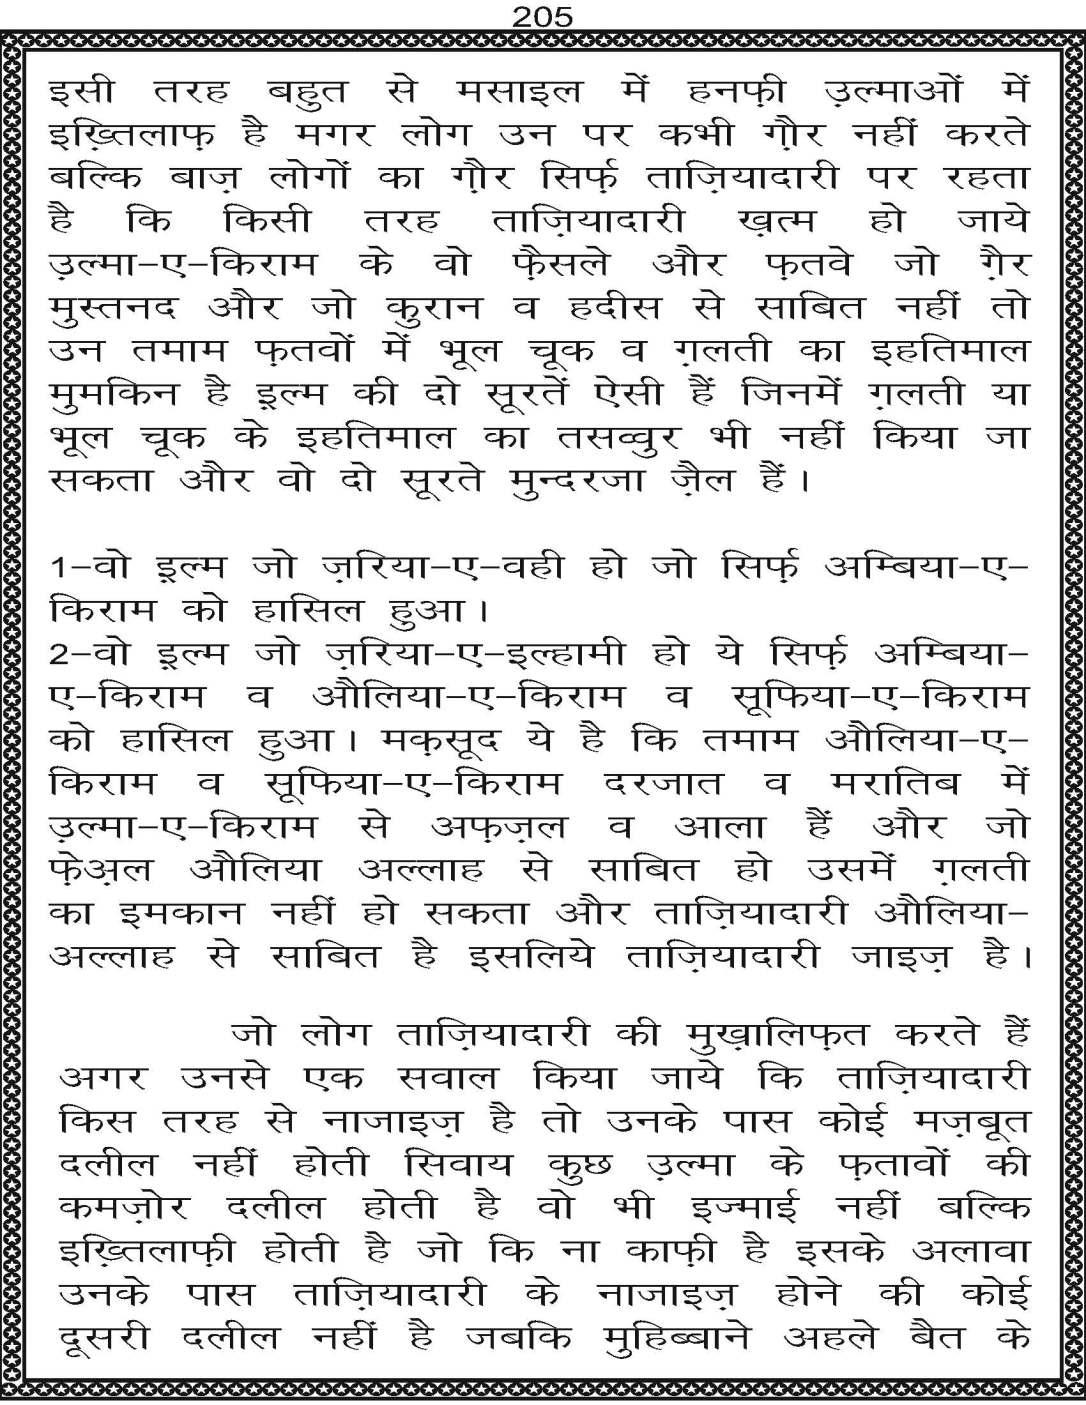 AzmateTaziyadari_Page_205